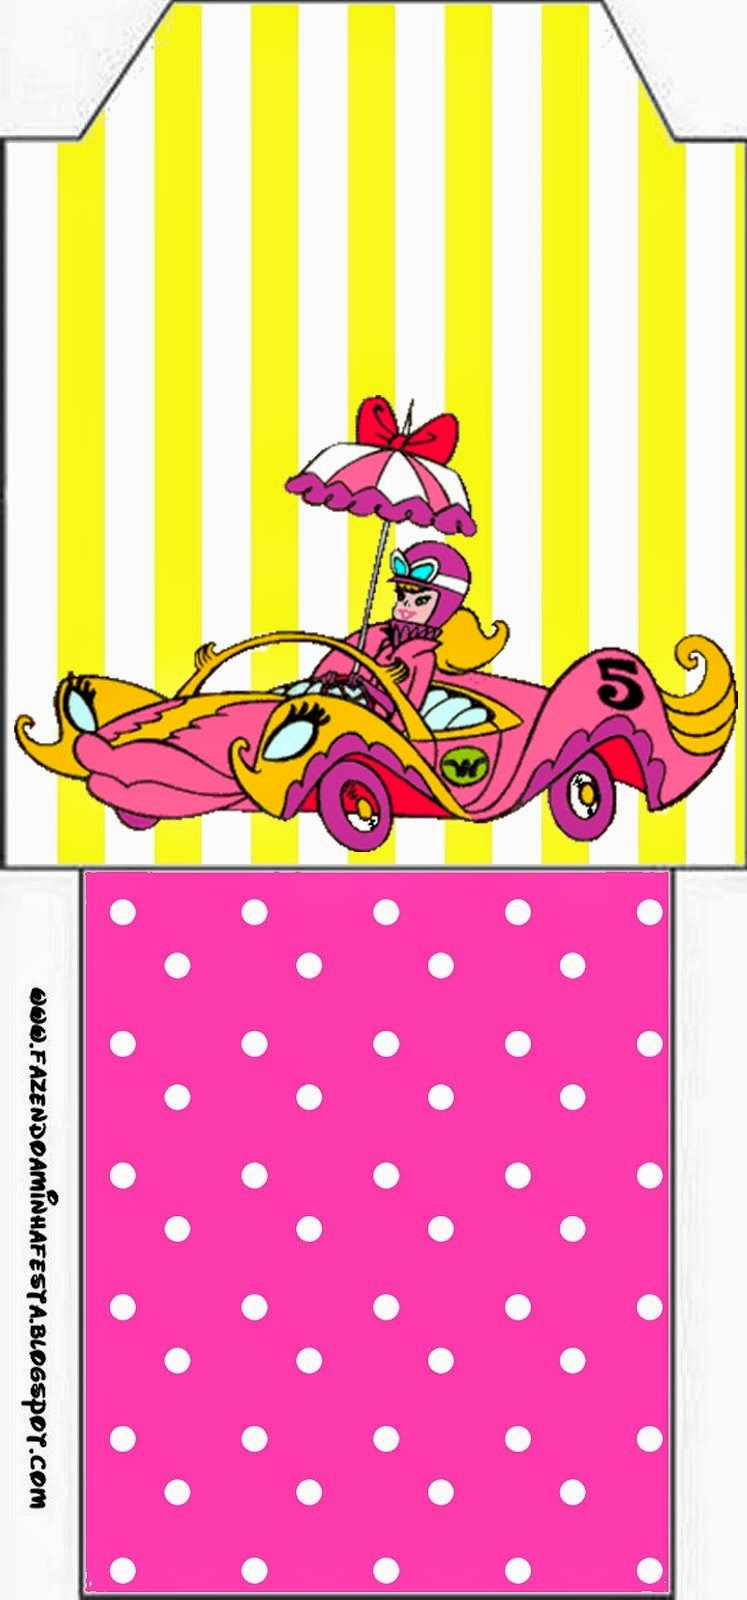 Bolsita de Té para imprimir gratis de Penelope Glamour Retro.